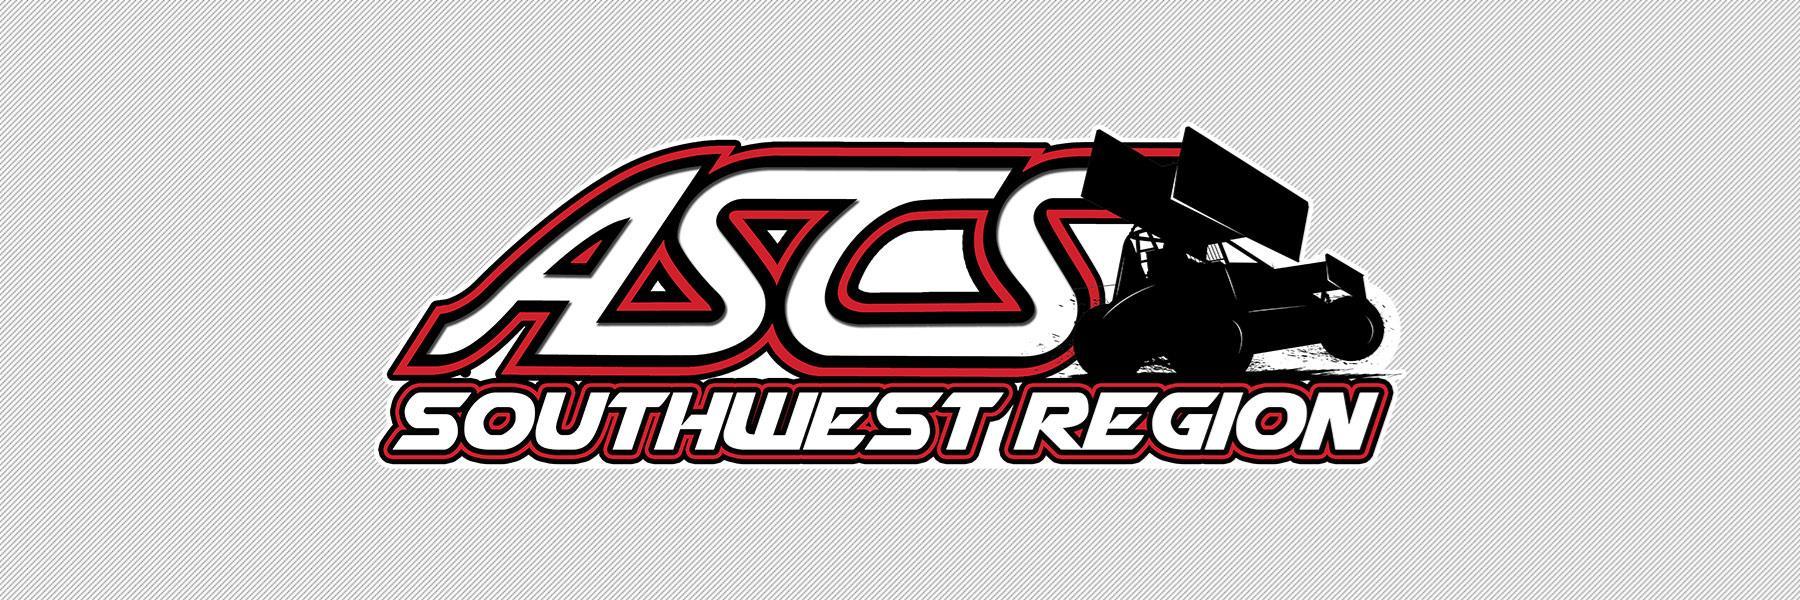 ASCS Southwest Region